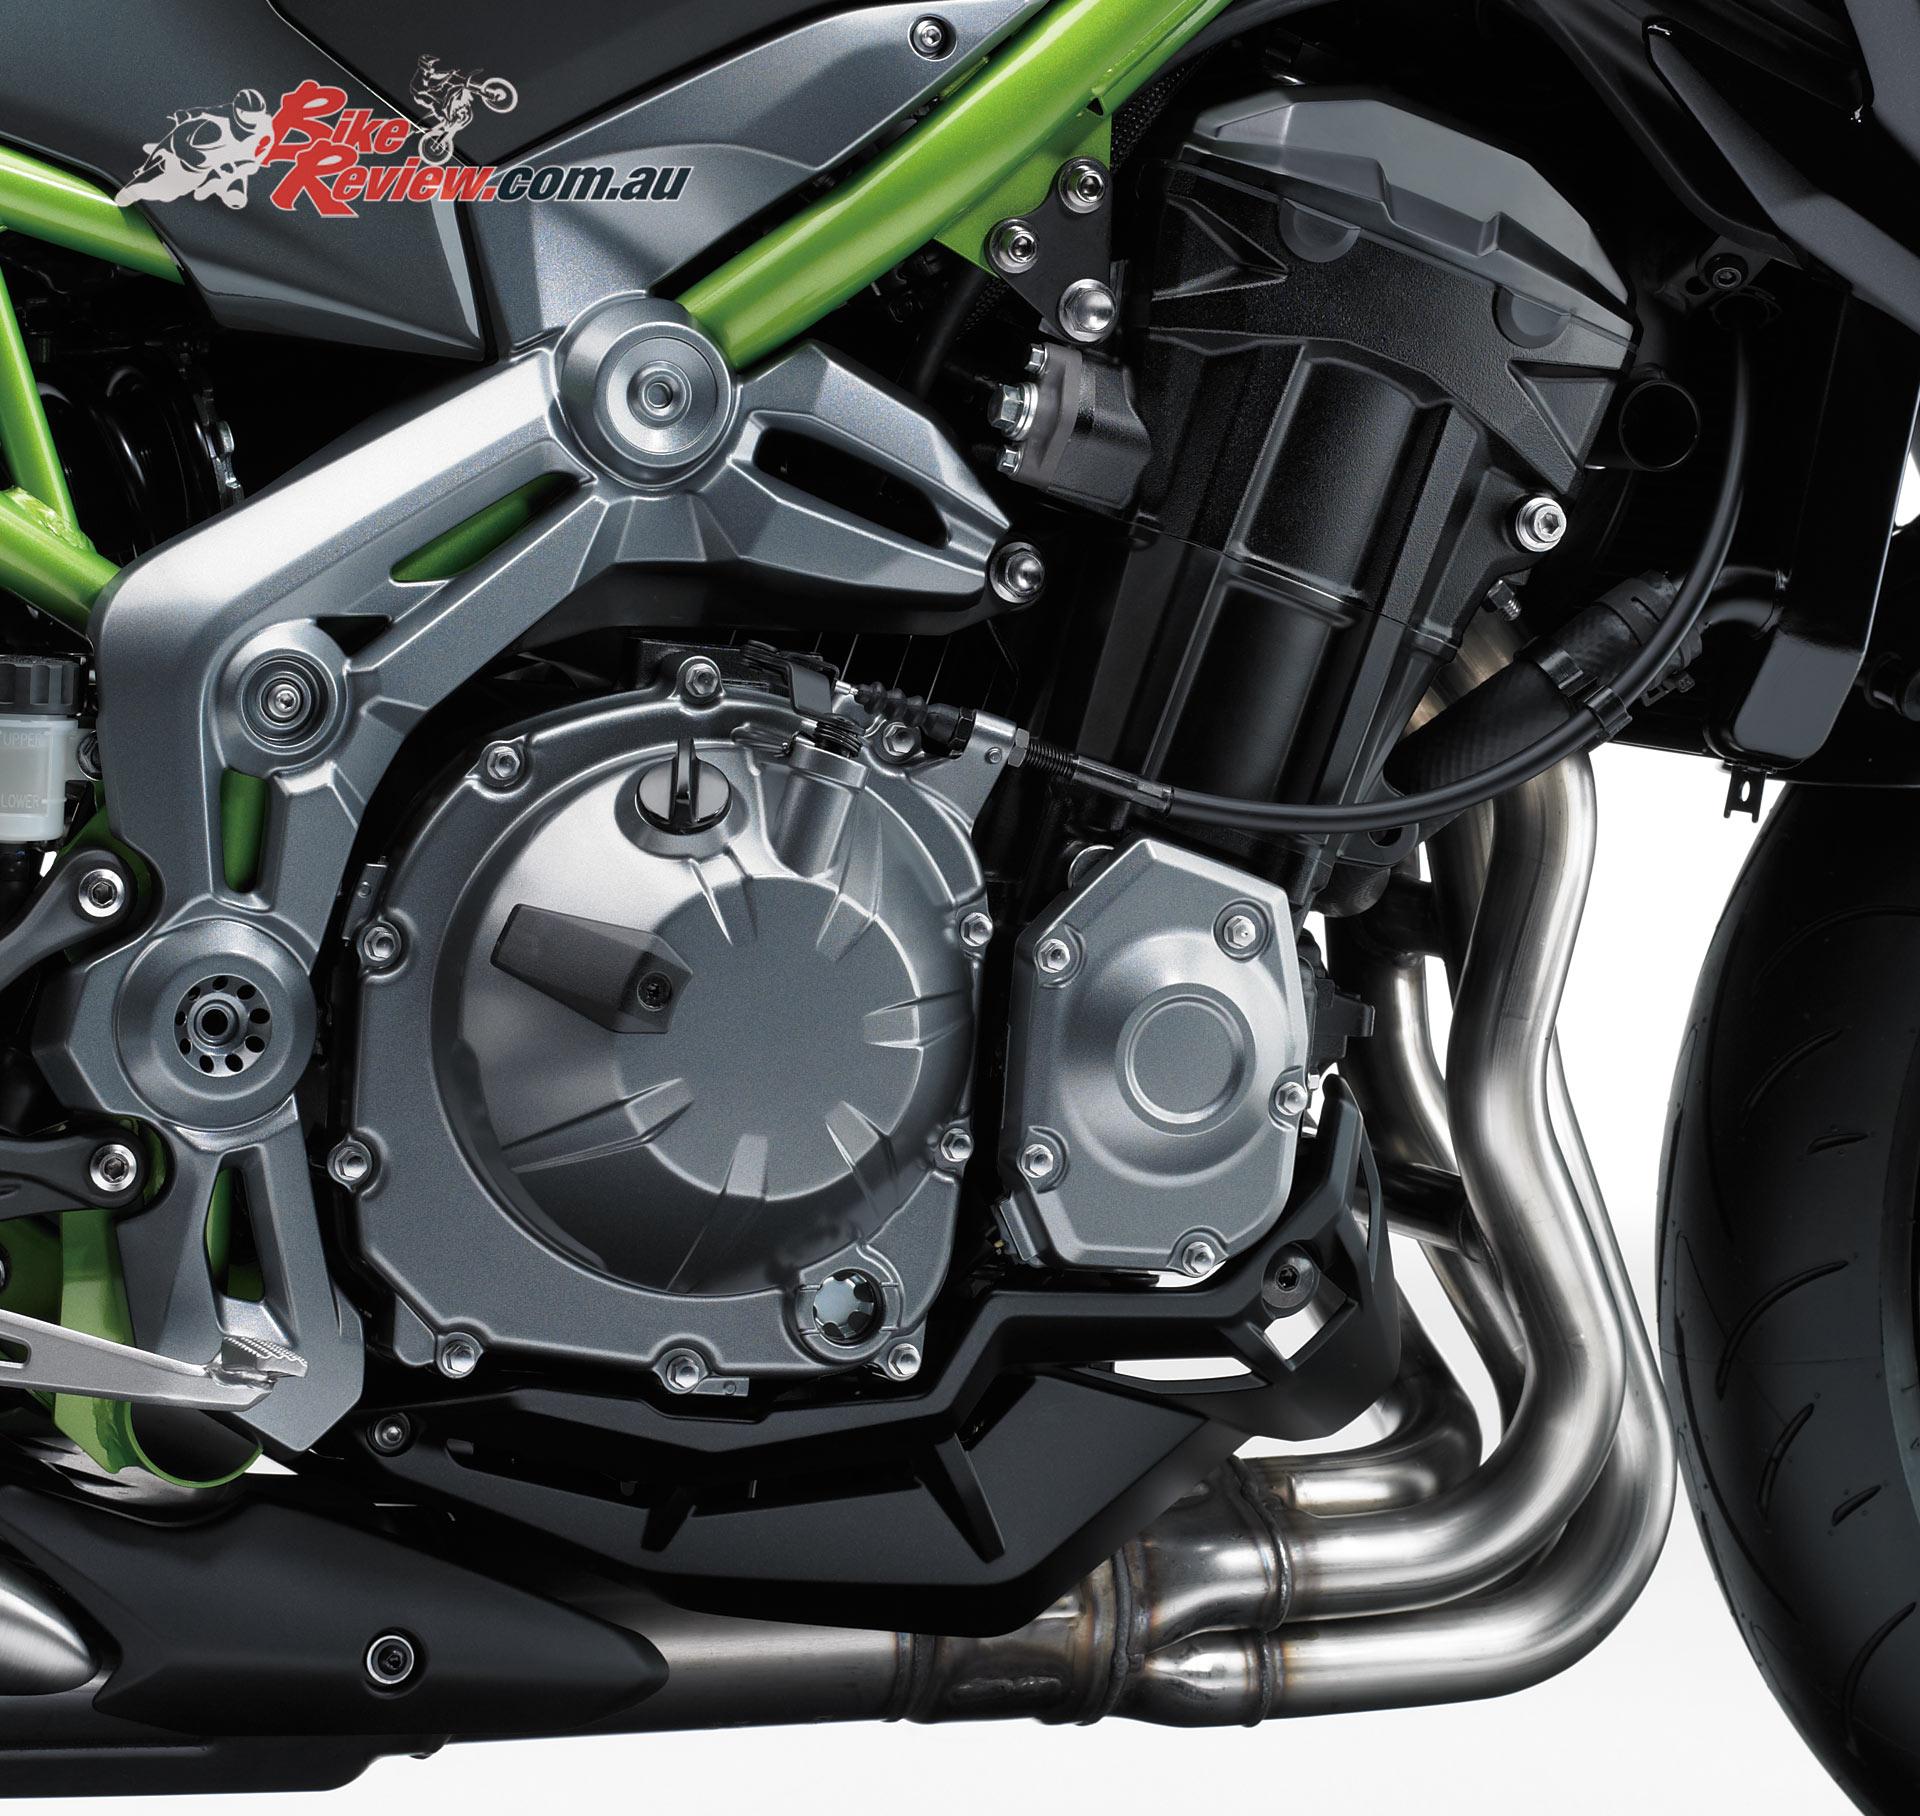 Z900 et Z650 2017 - Page 3 2017-Kawasaki-Z900-16